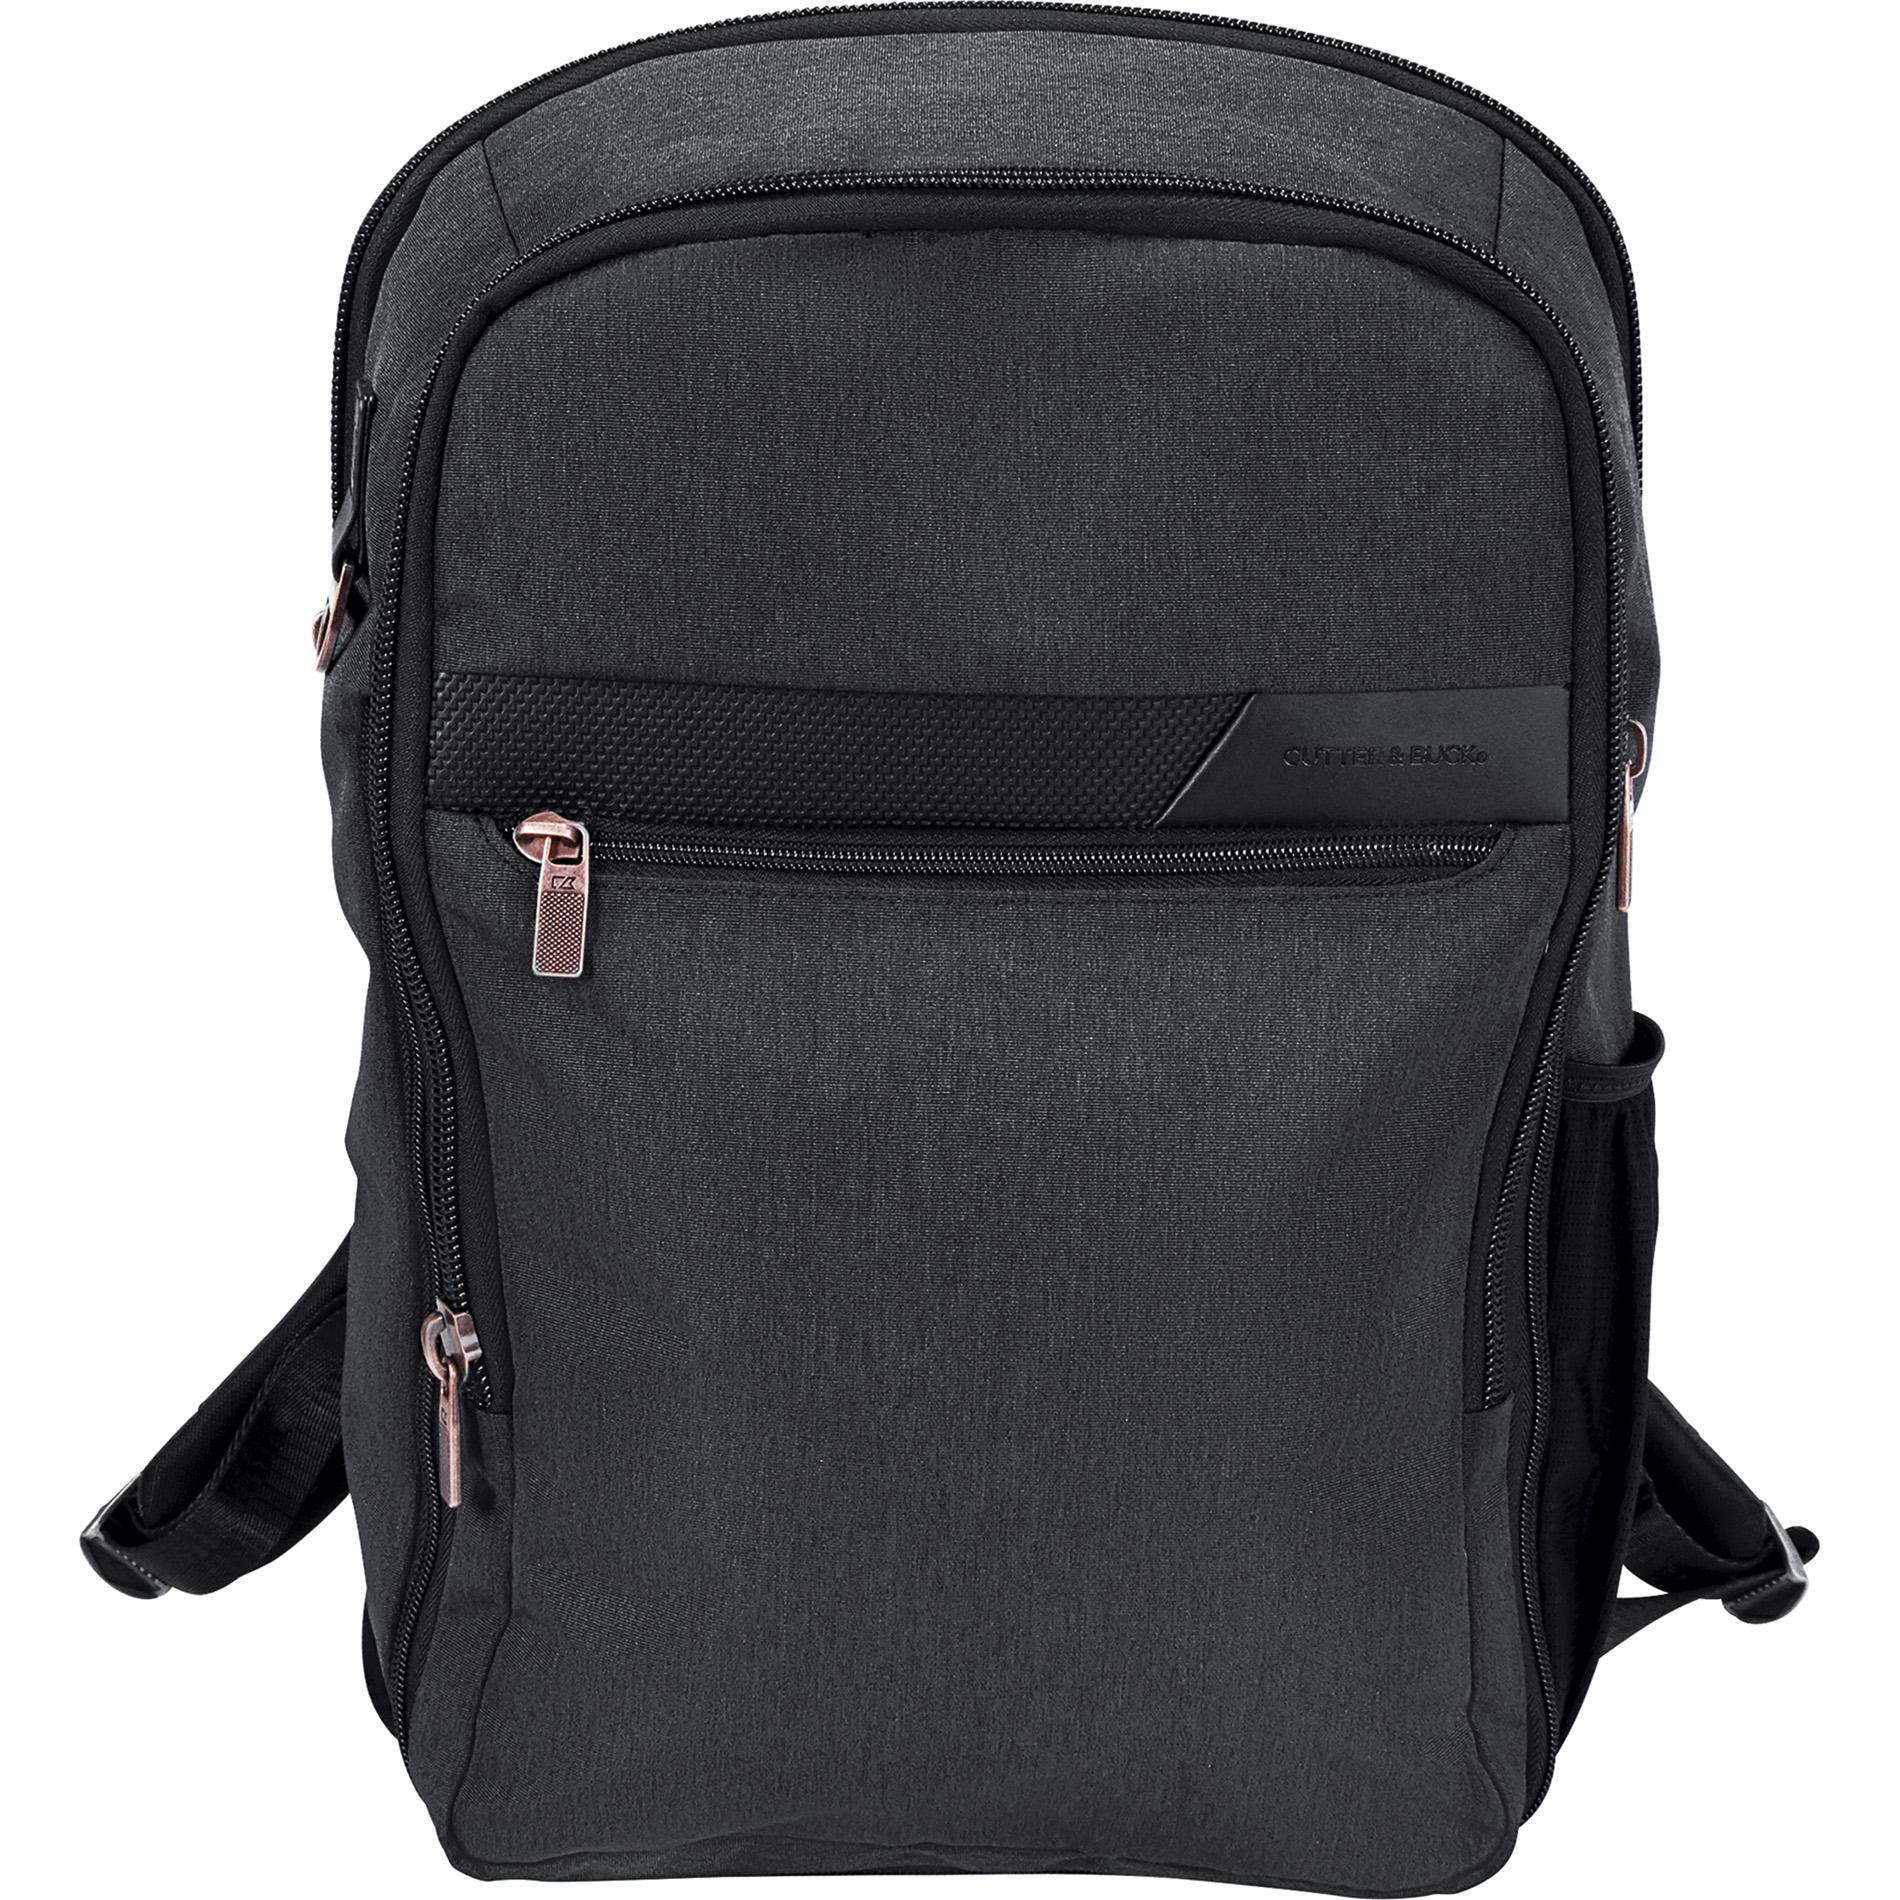 "Cutter & Buck 9870-53 - Slim 15"" Computer Backpack"